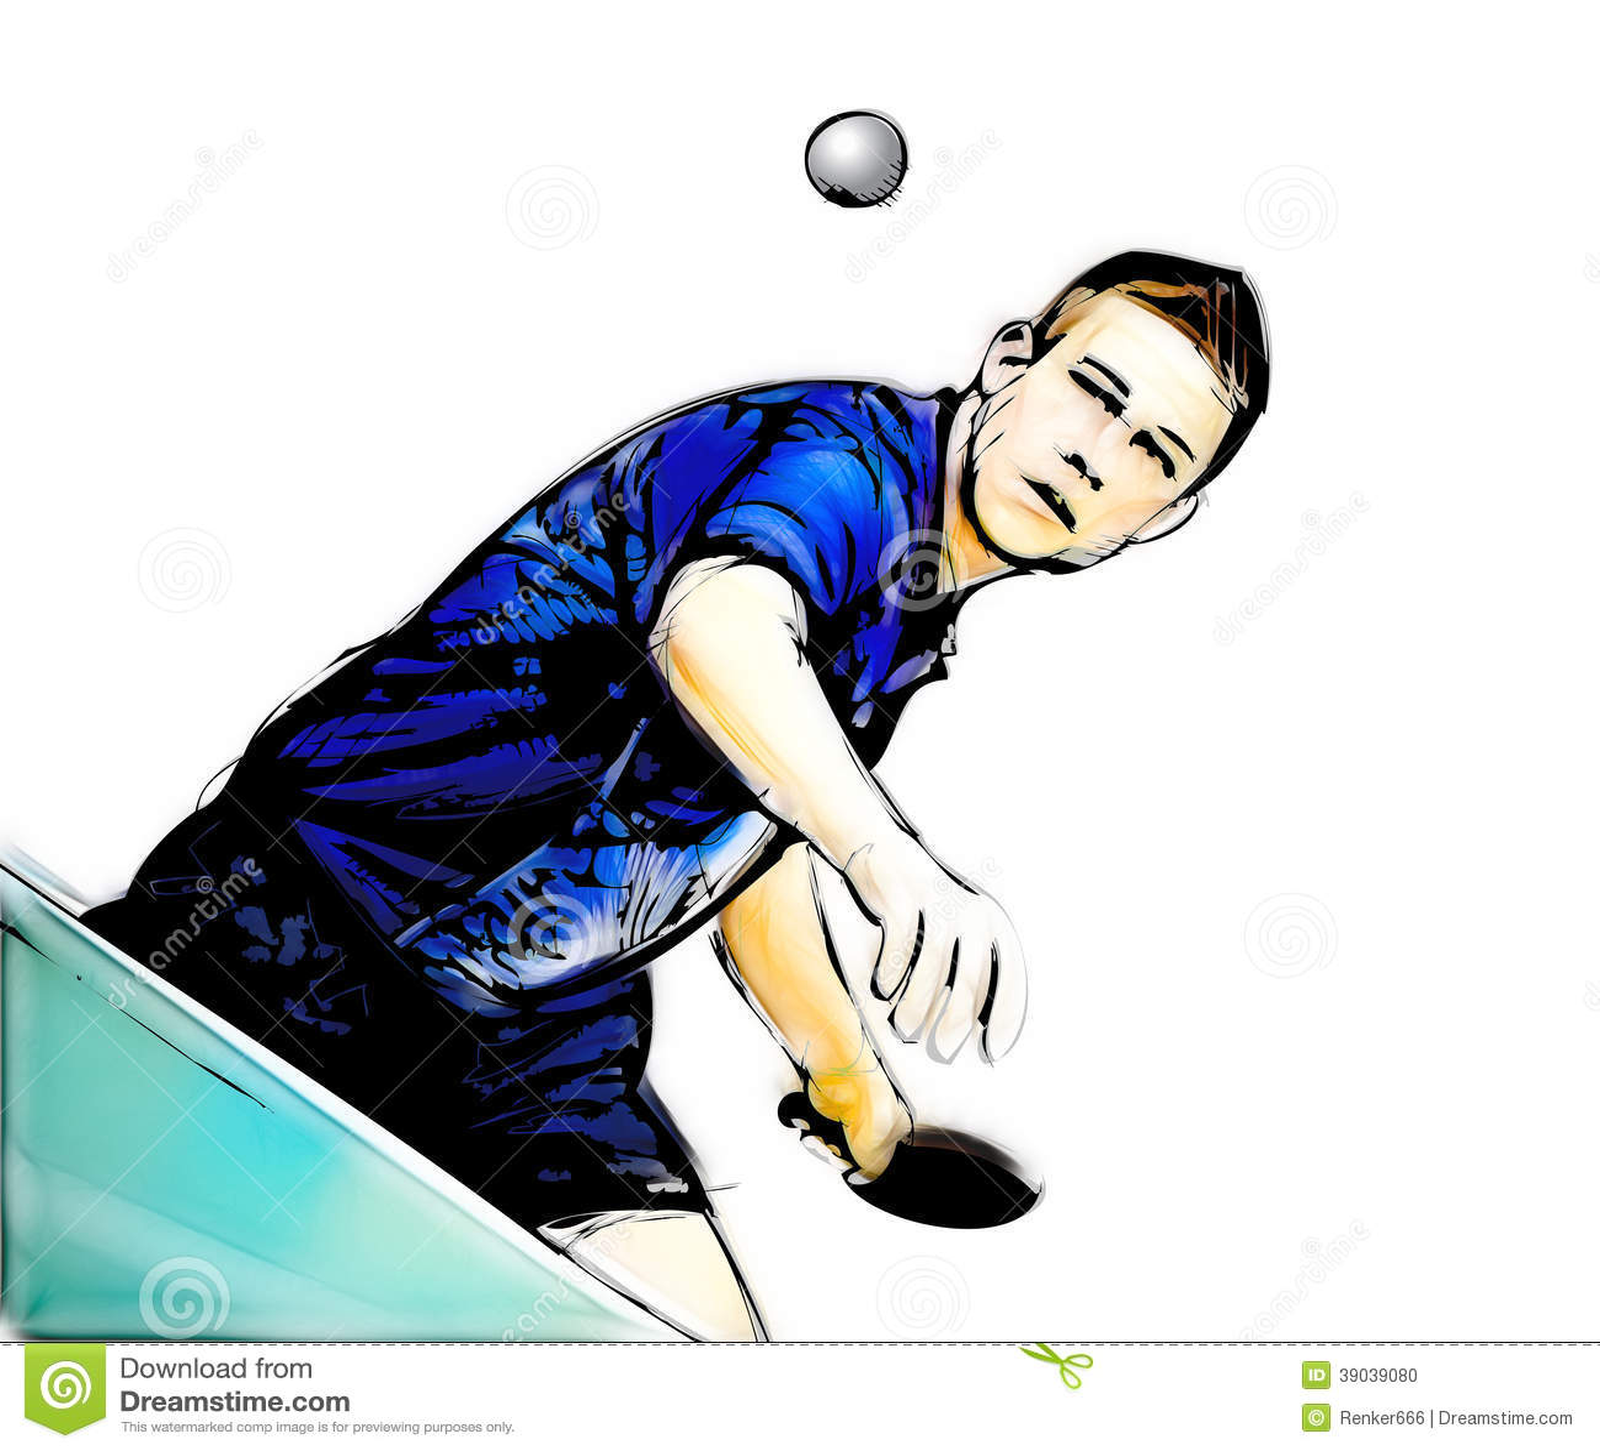 Ping Pong Player Illustration Stock Illustration - Image ...